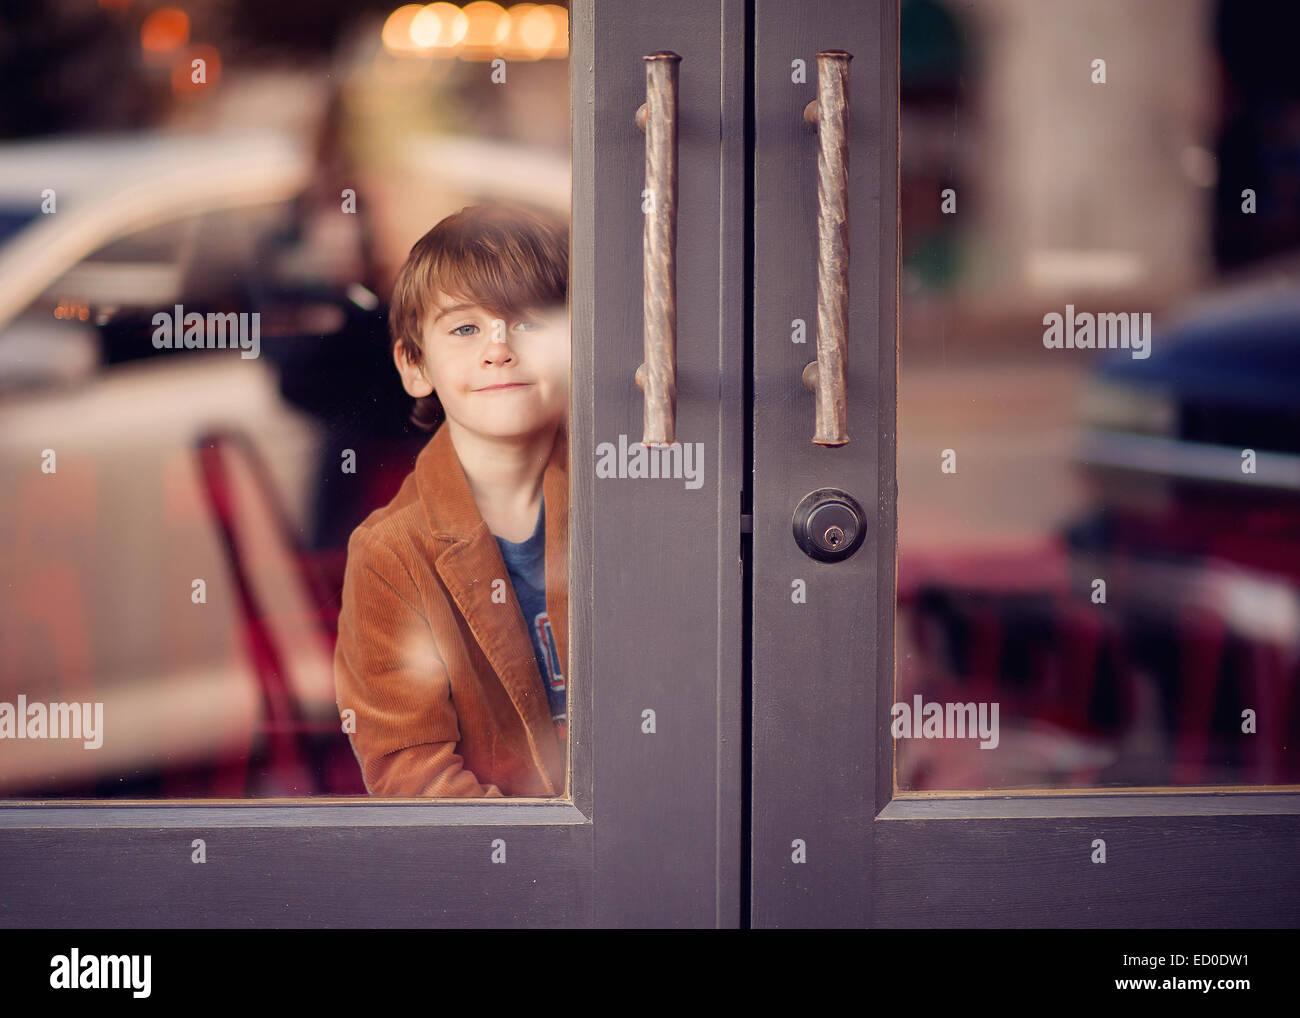 Boy looking through glass doors - Stock Image